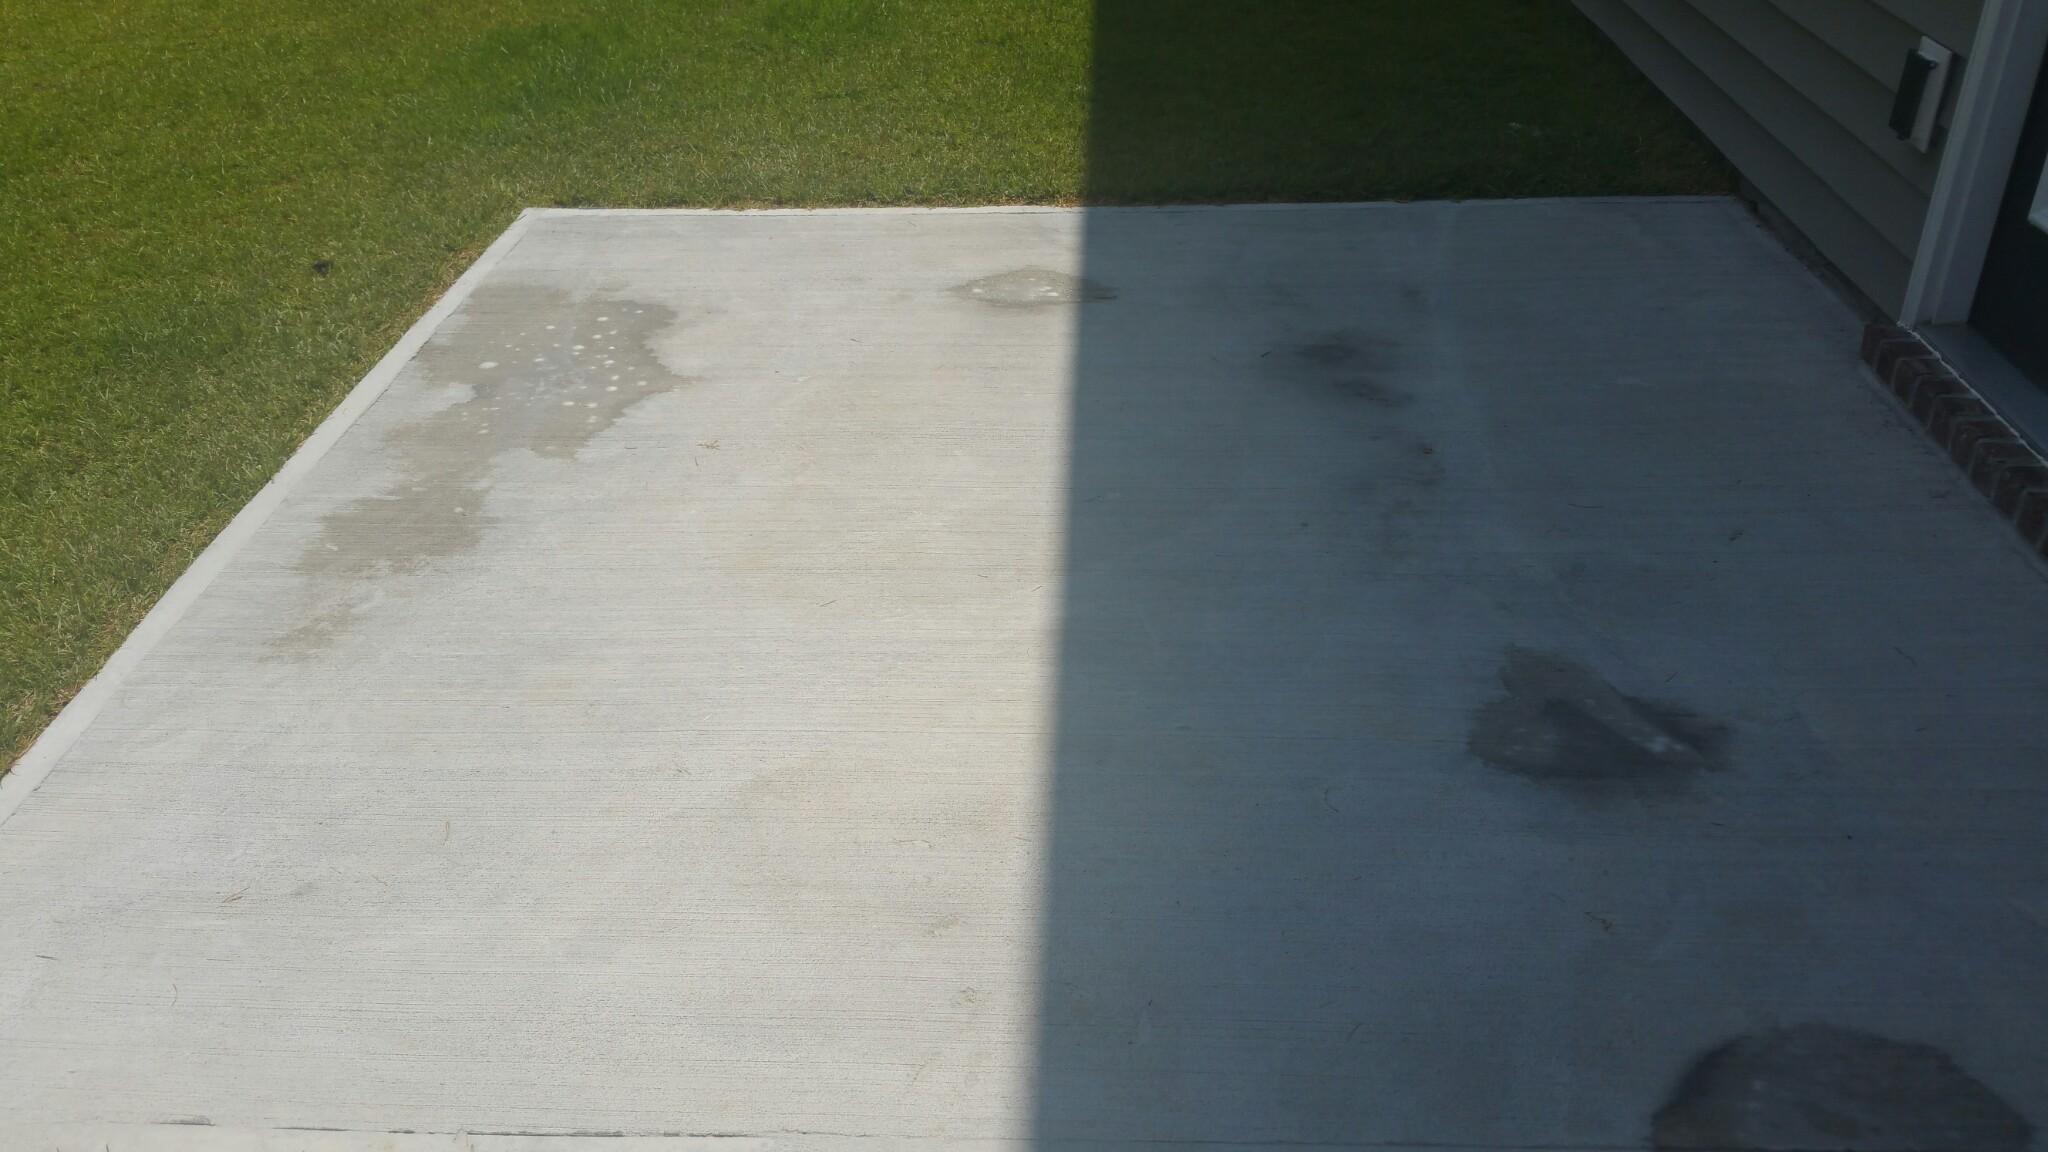 Removing Rust Stains Pressure Washing Savannah Ga